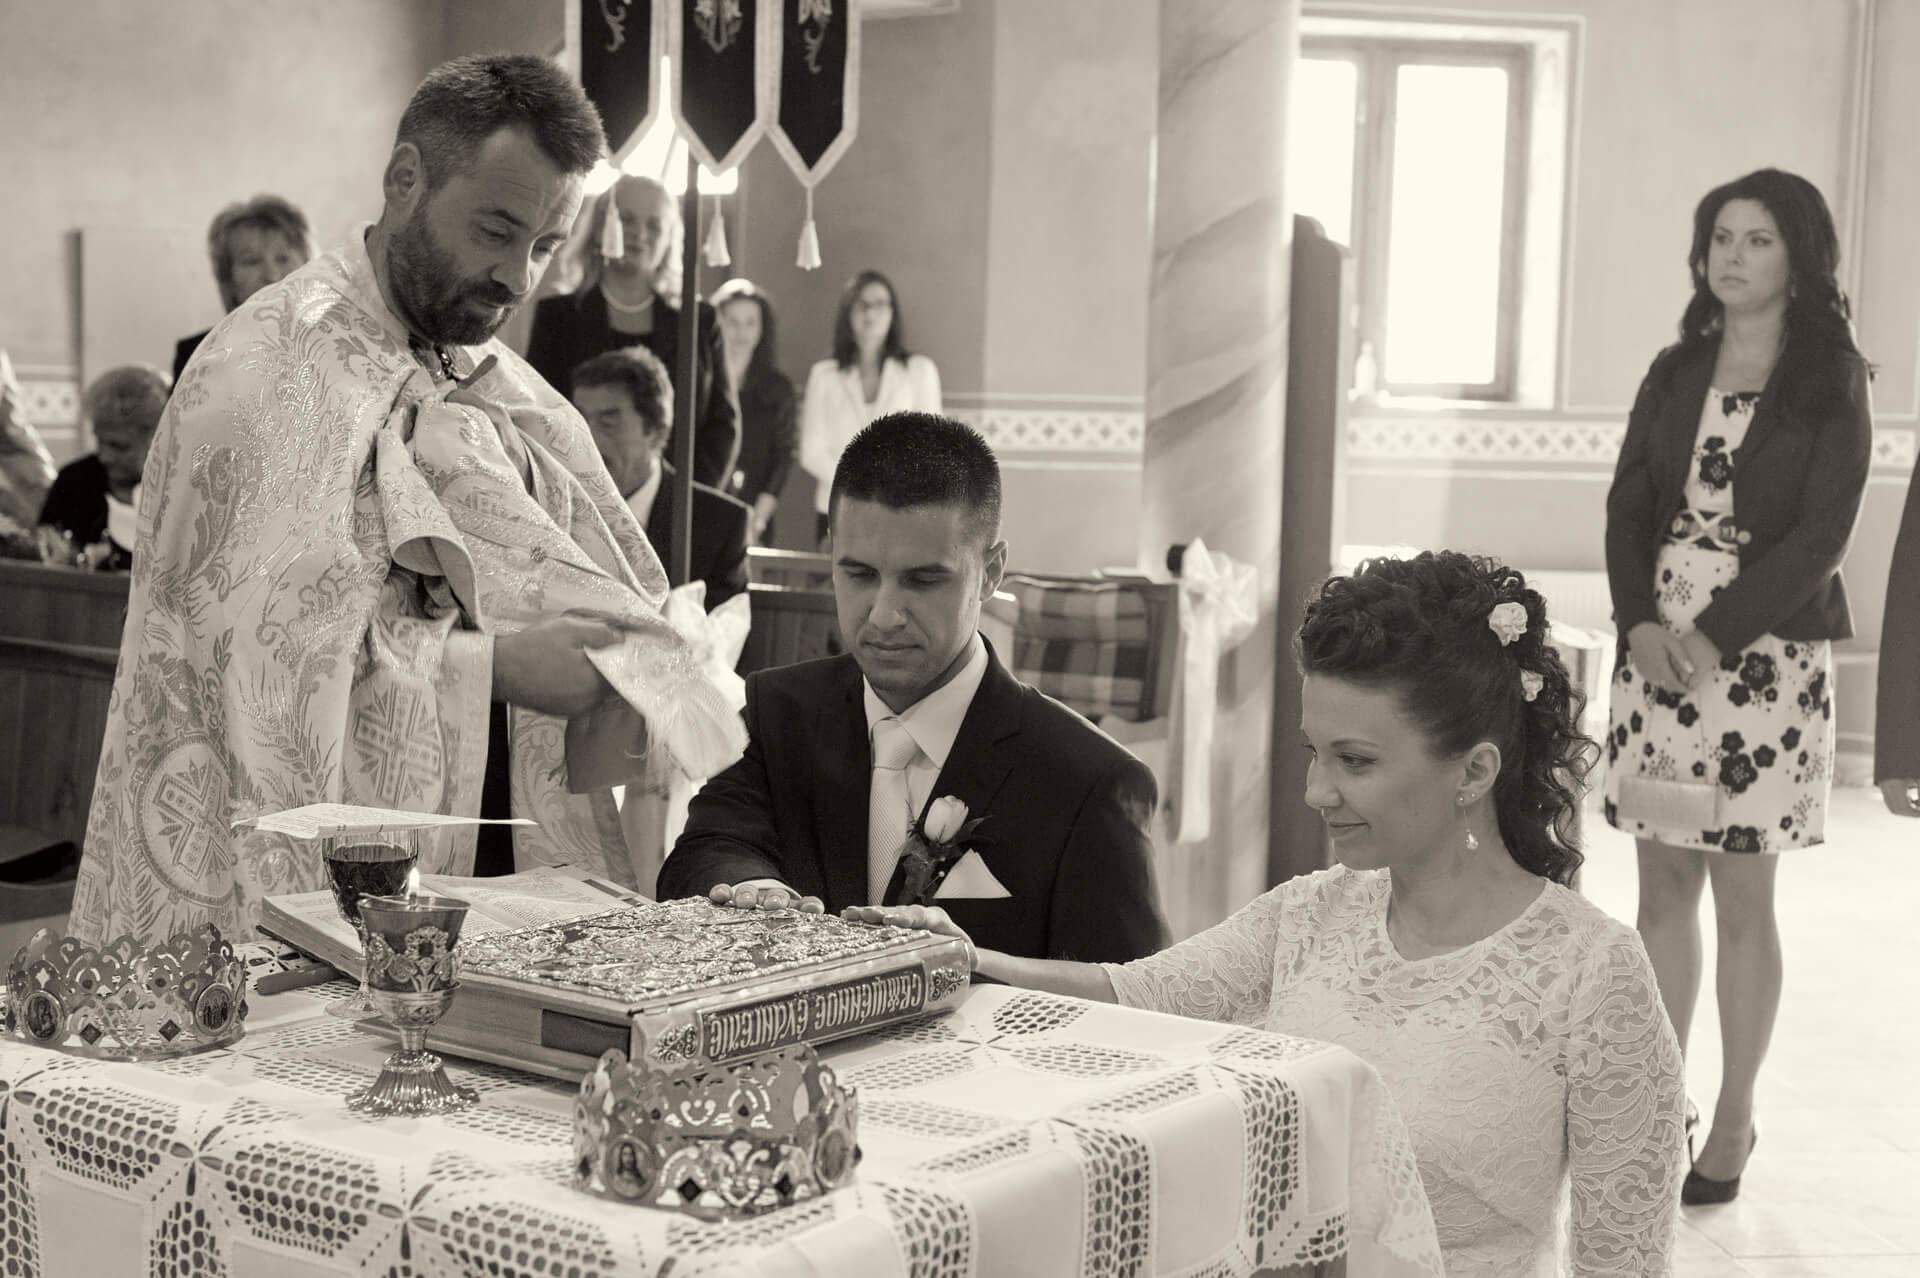 svadba svadobny kostol obrad profesionalne fotenie fotograf Peter Norulak Kosice__11